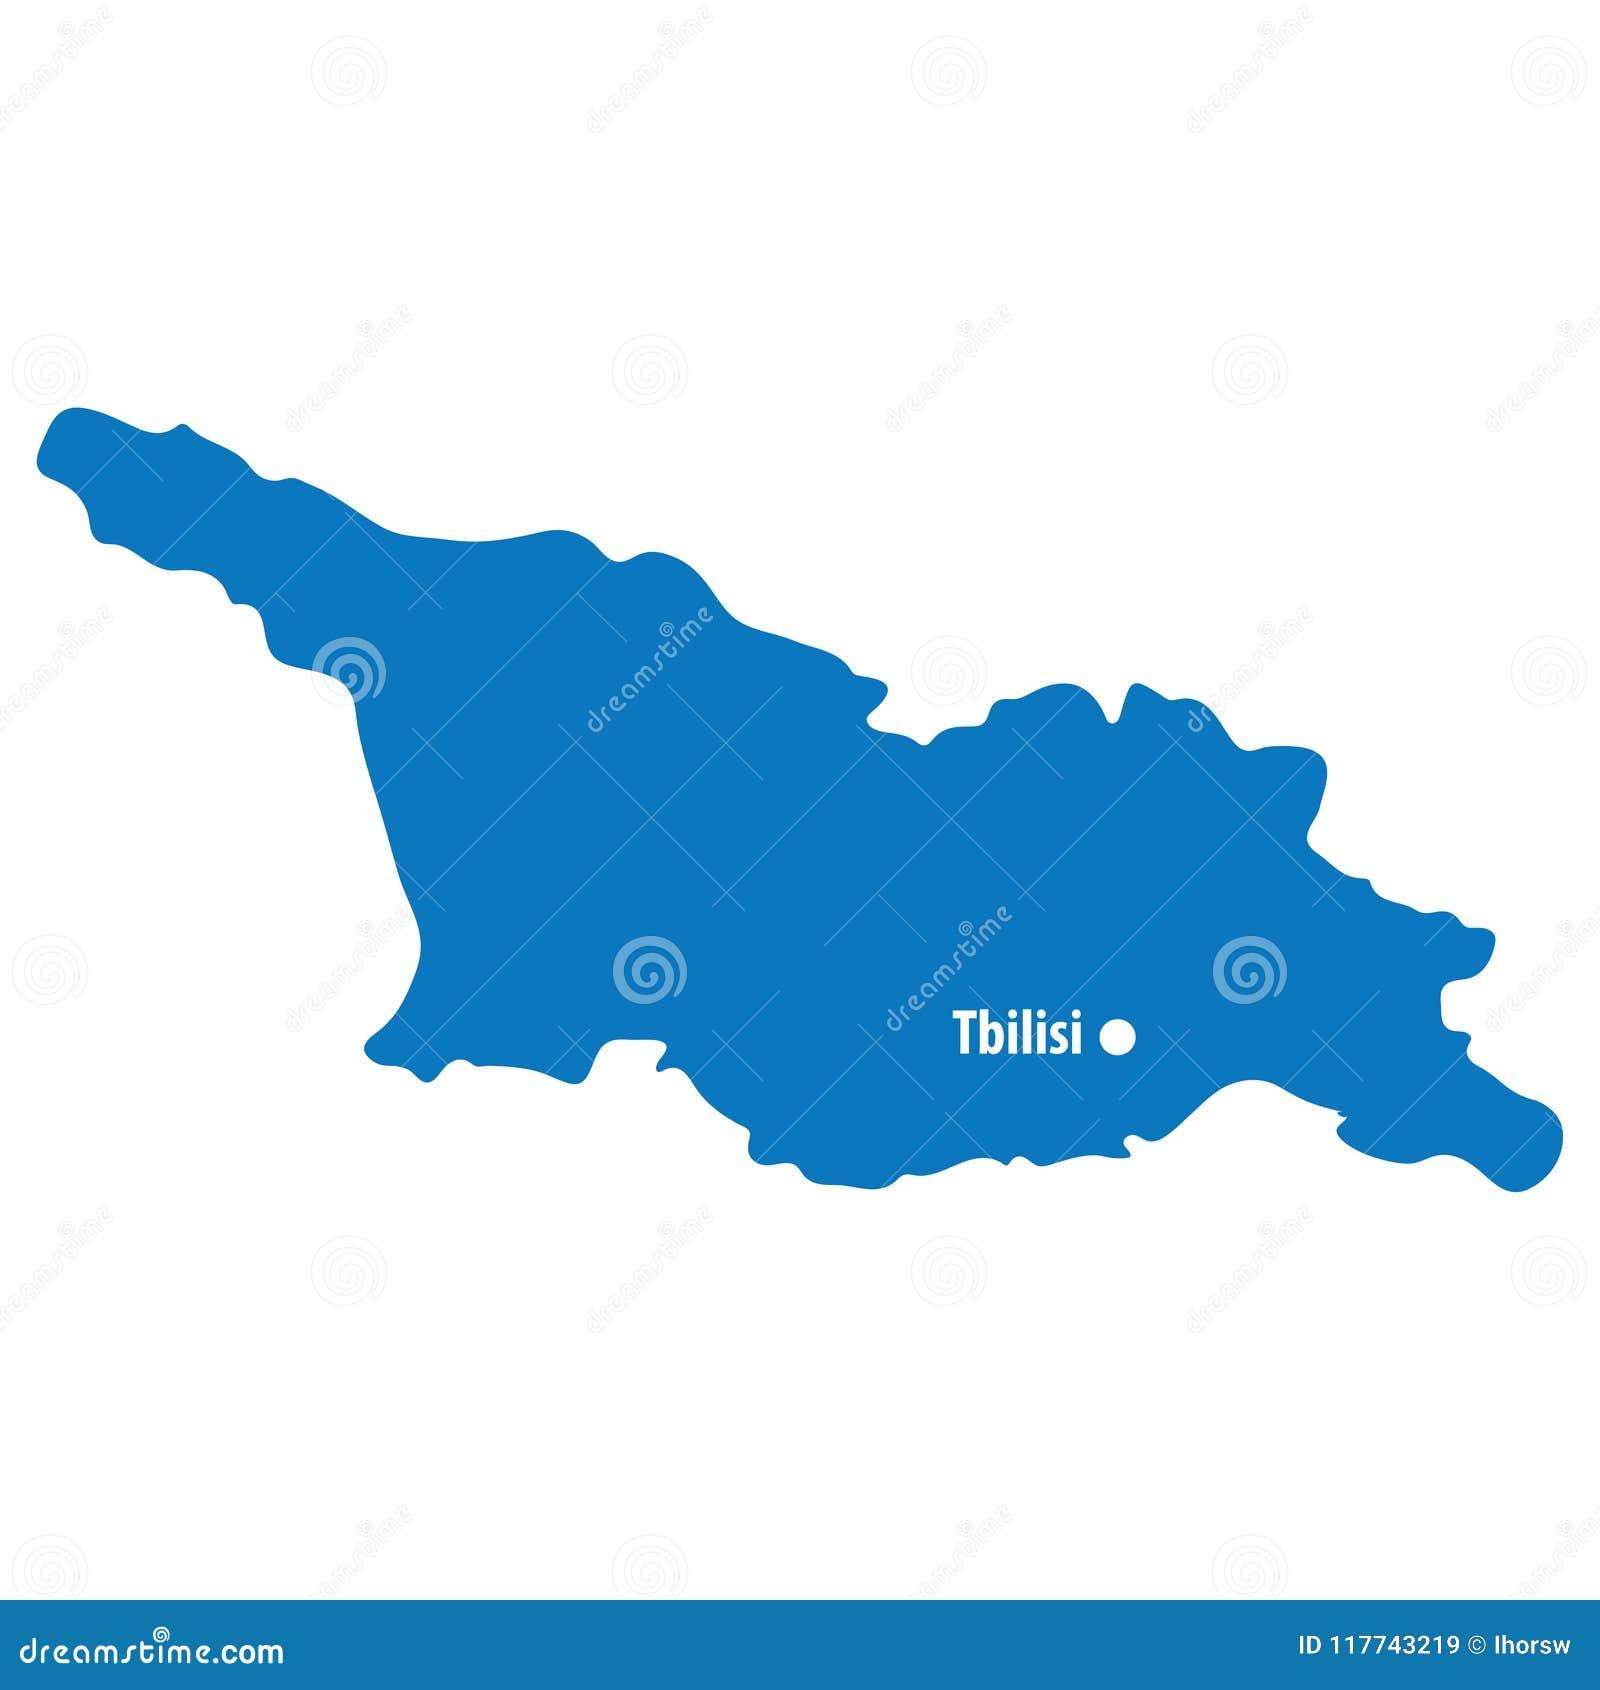 Map Of Georgia With Capital.Blue Similar Georgia Map Vector With Capital City Tbilisi European